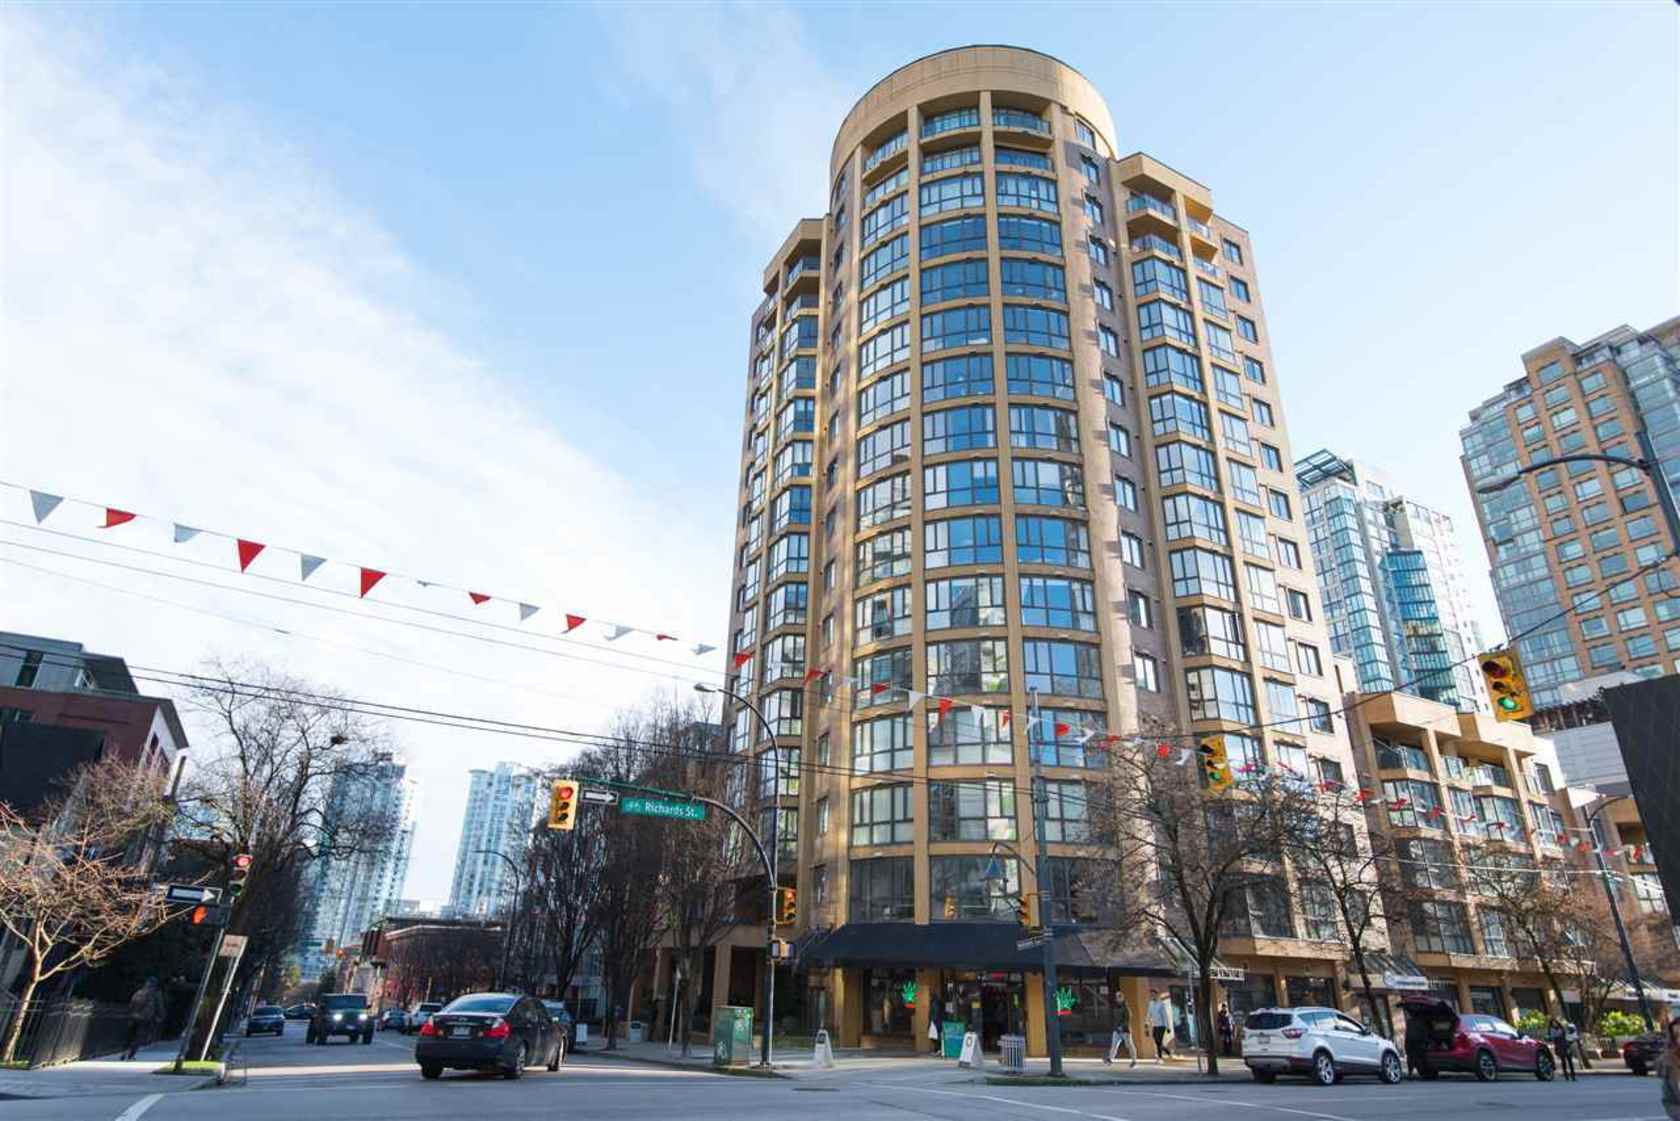 488-helmcken-street-yaletown-vancouver-west-17 at 310 - 488 Helmcken Street, Yaletown, Vancouver West